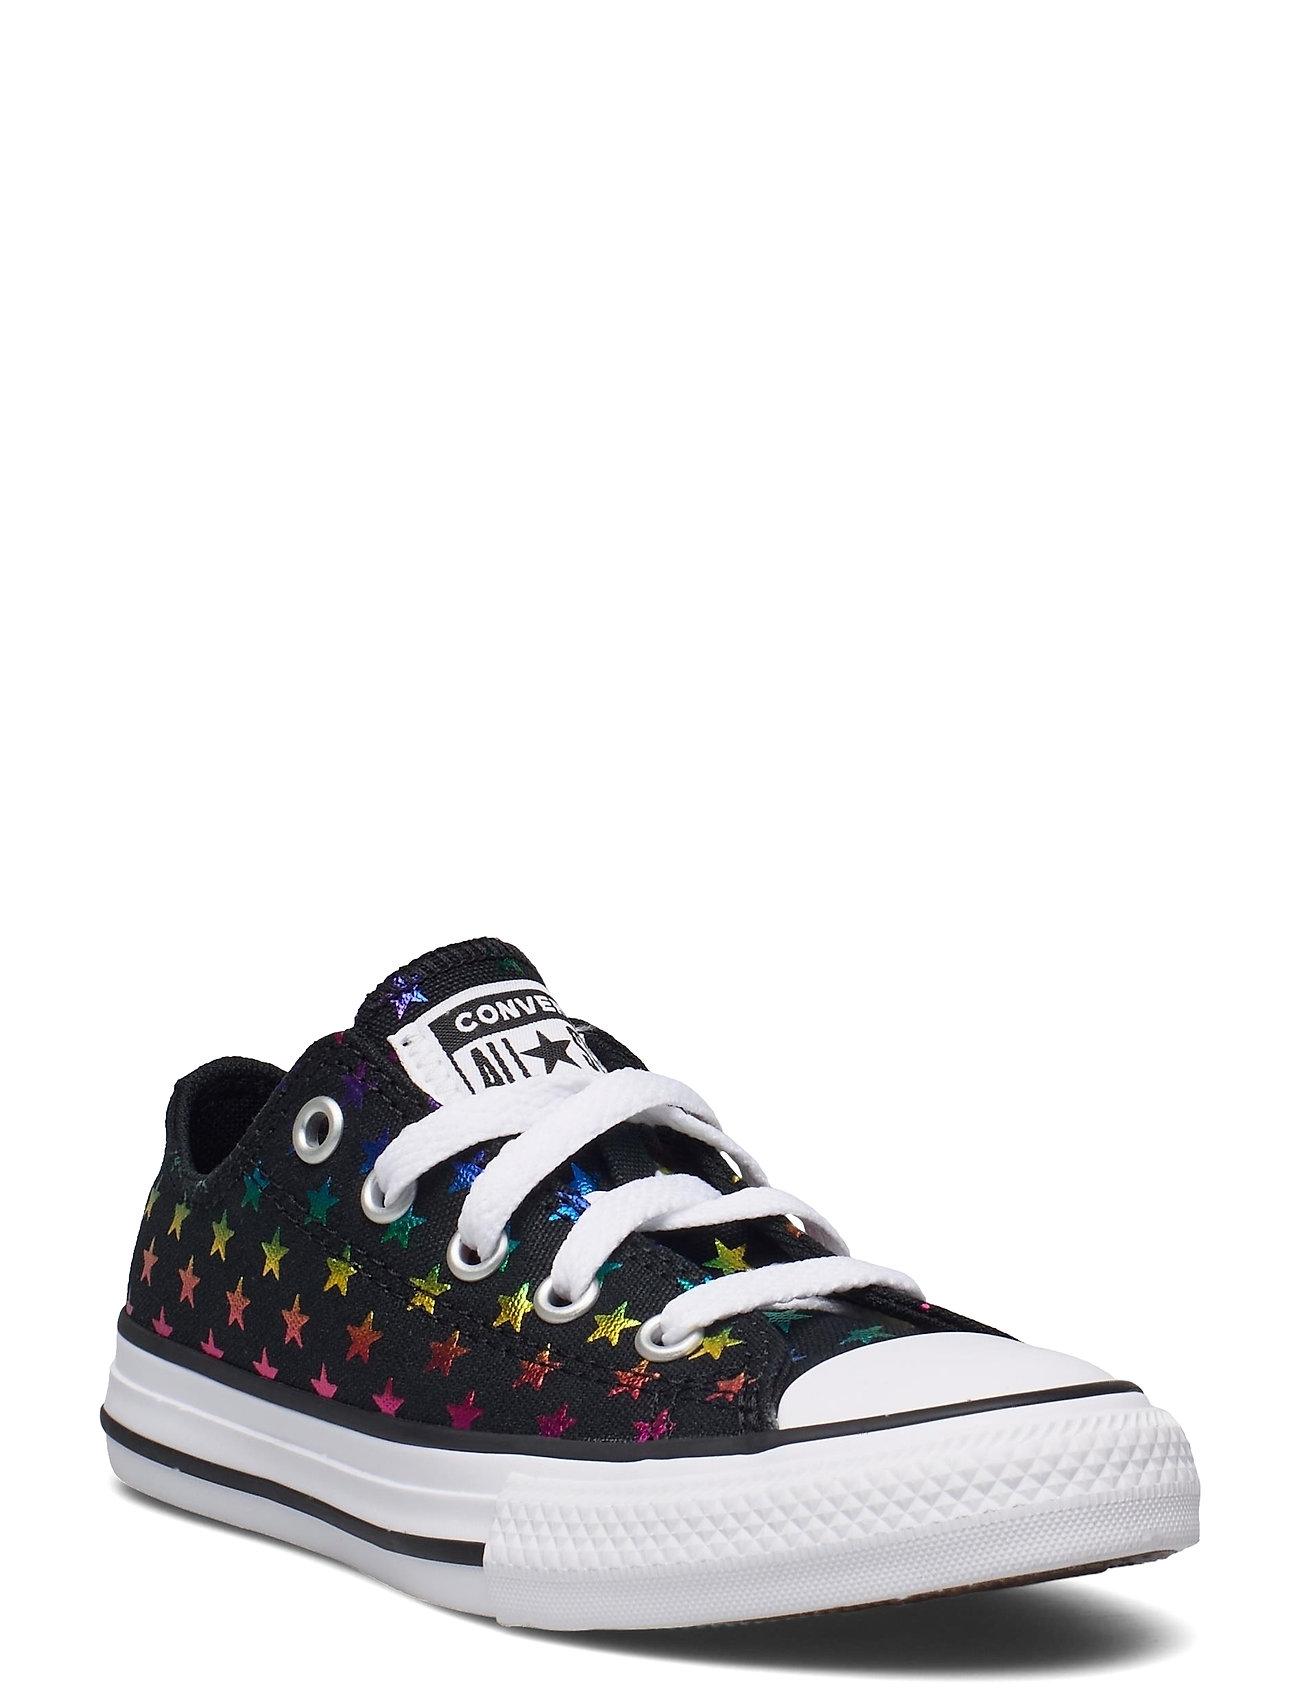 Image of Ctas Ox Black/White/Black Low-top Sneakers Sort Converse (3533872011)